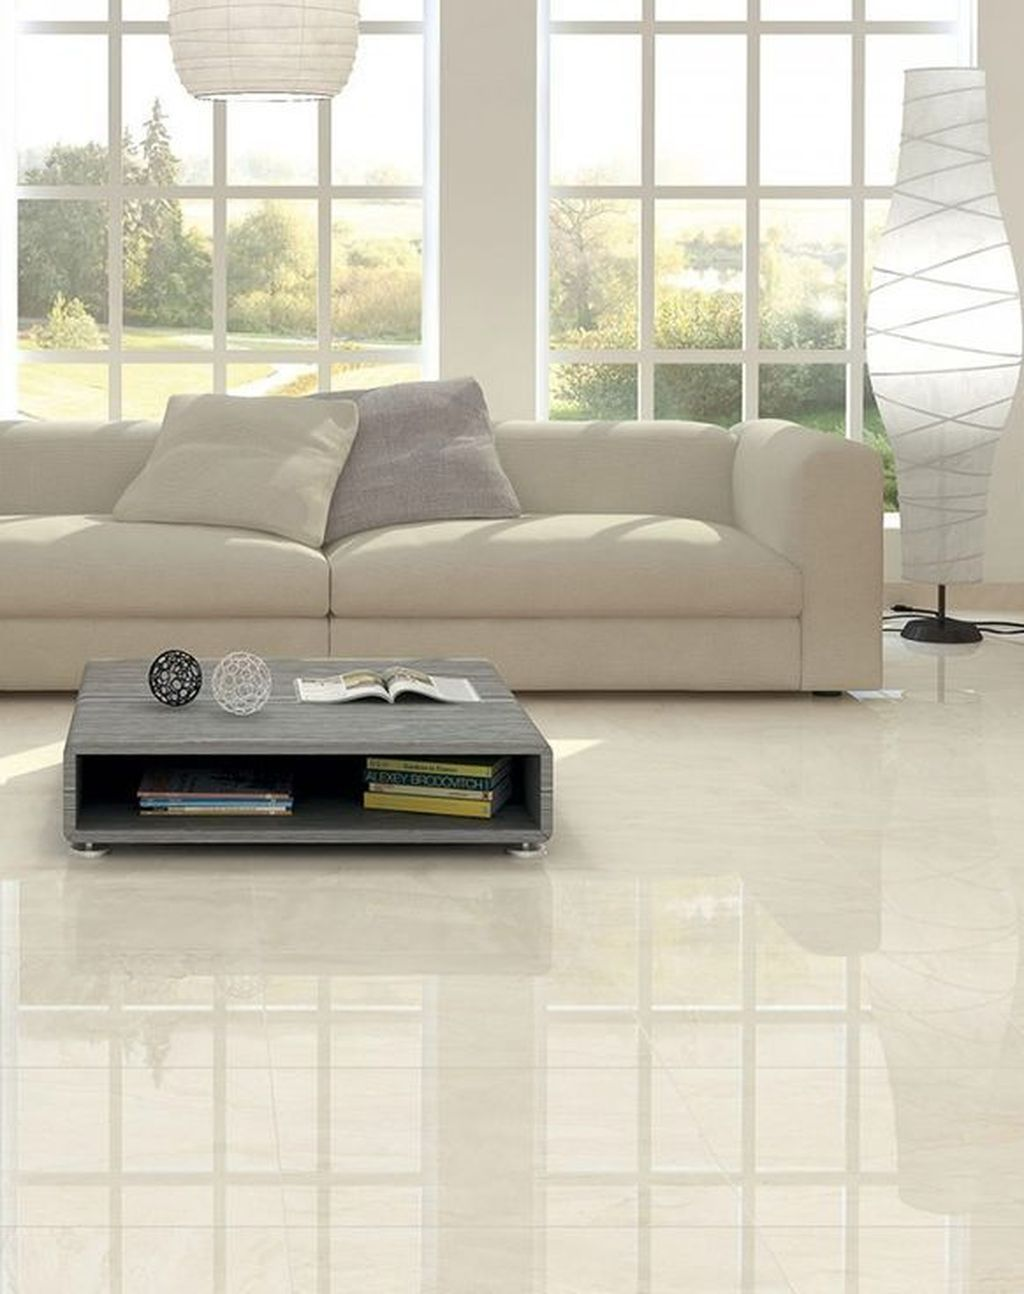 31 Chic Living Room Design Ideas With Floor Granite Tile To Have Living Room Tiles Tile Floor Living Room Polished Porcelain Tiles